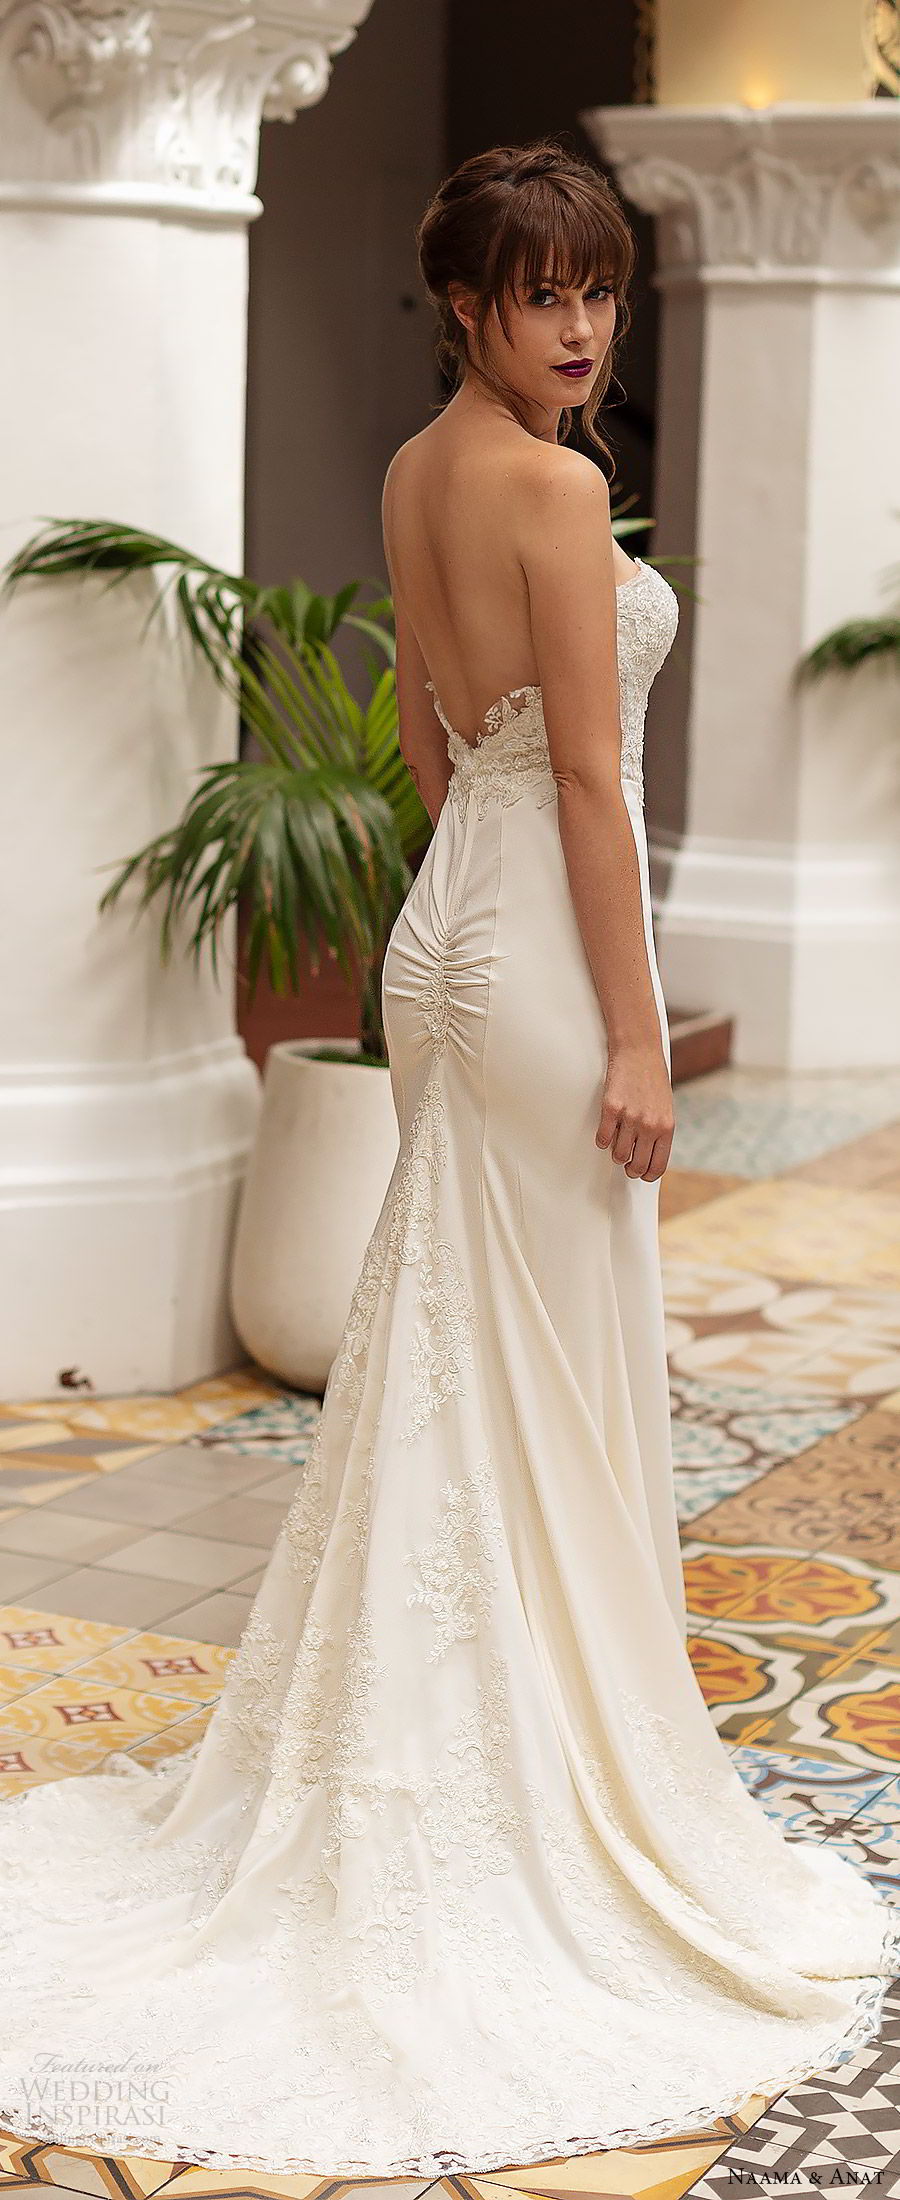 naama anat 2019 bridal strapless sweetheart embellished bodice sheath wedding dress  low back chapel train elegant modern (4) zbv